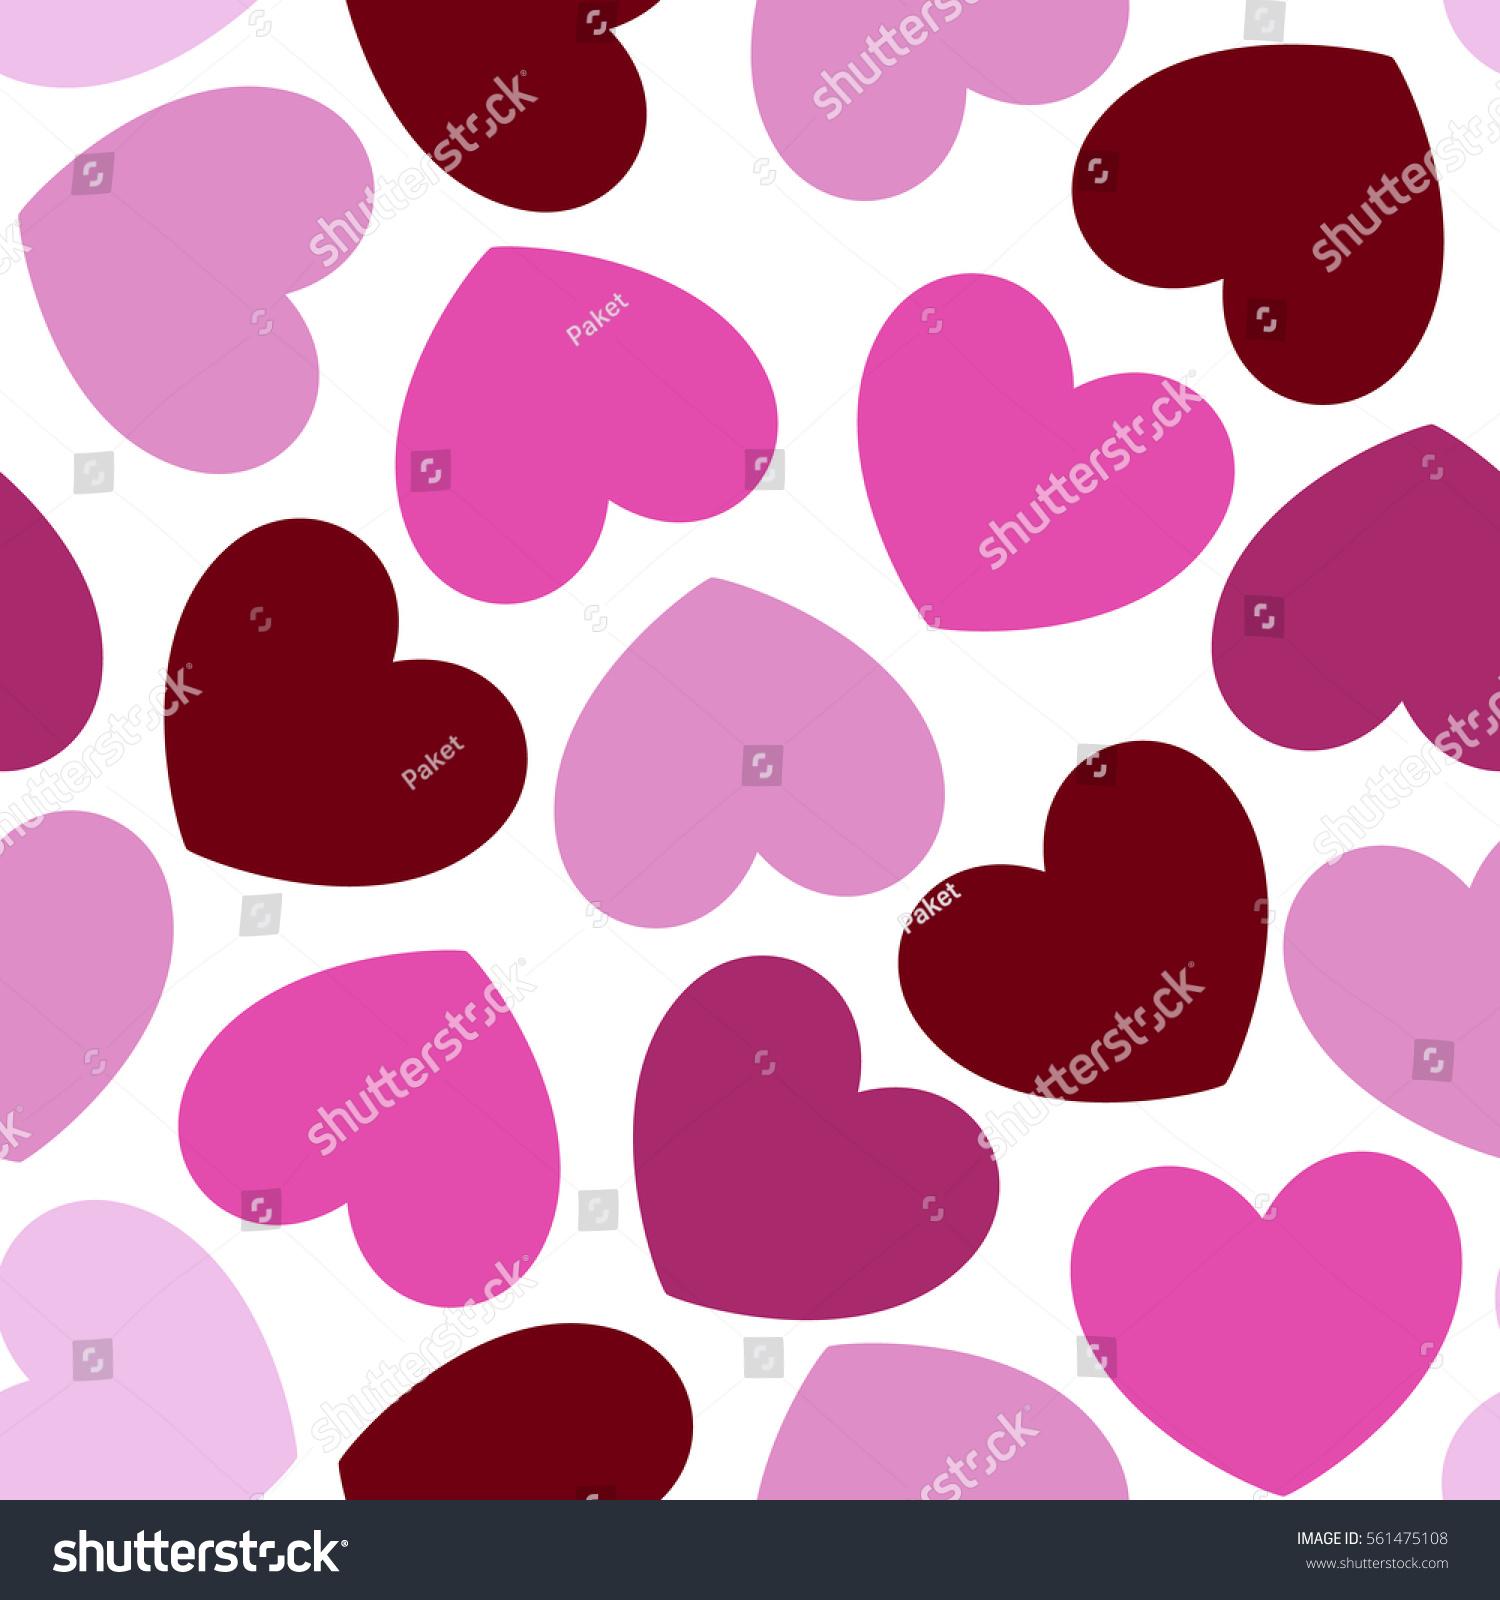 Romantic vector seamless background greeting card wallpaper vector art -  Vectors Illustrations Footage Music Seamless Heart Pattern Romantic Pink Hearts Background Valentines Day Card Wedding Baby